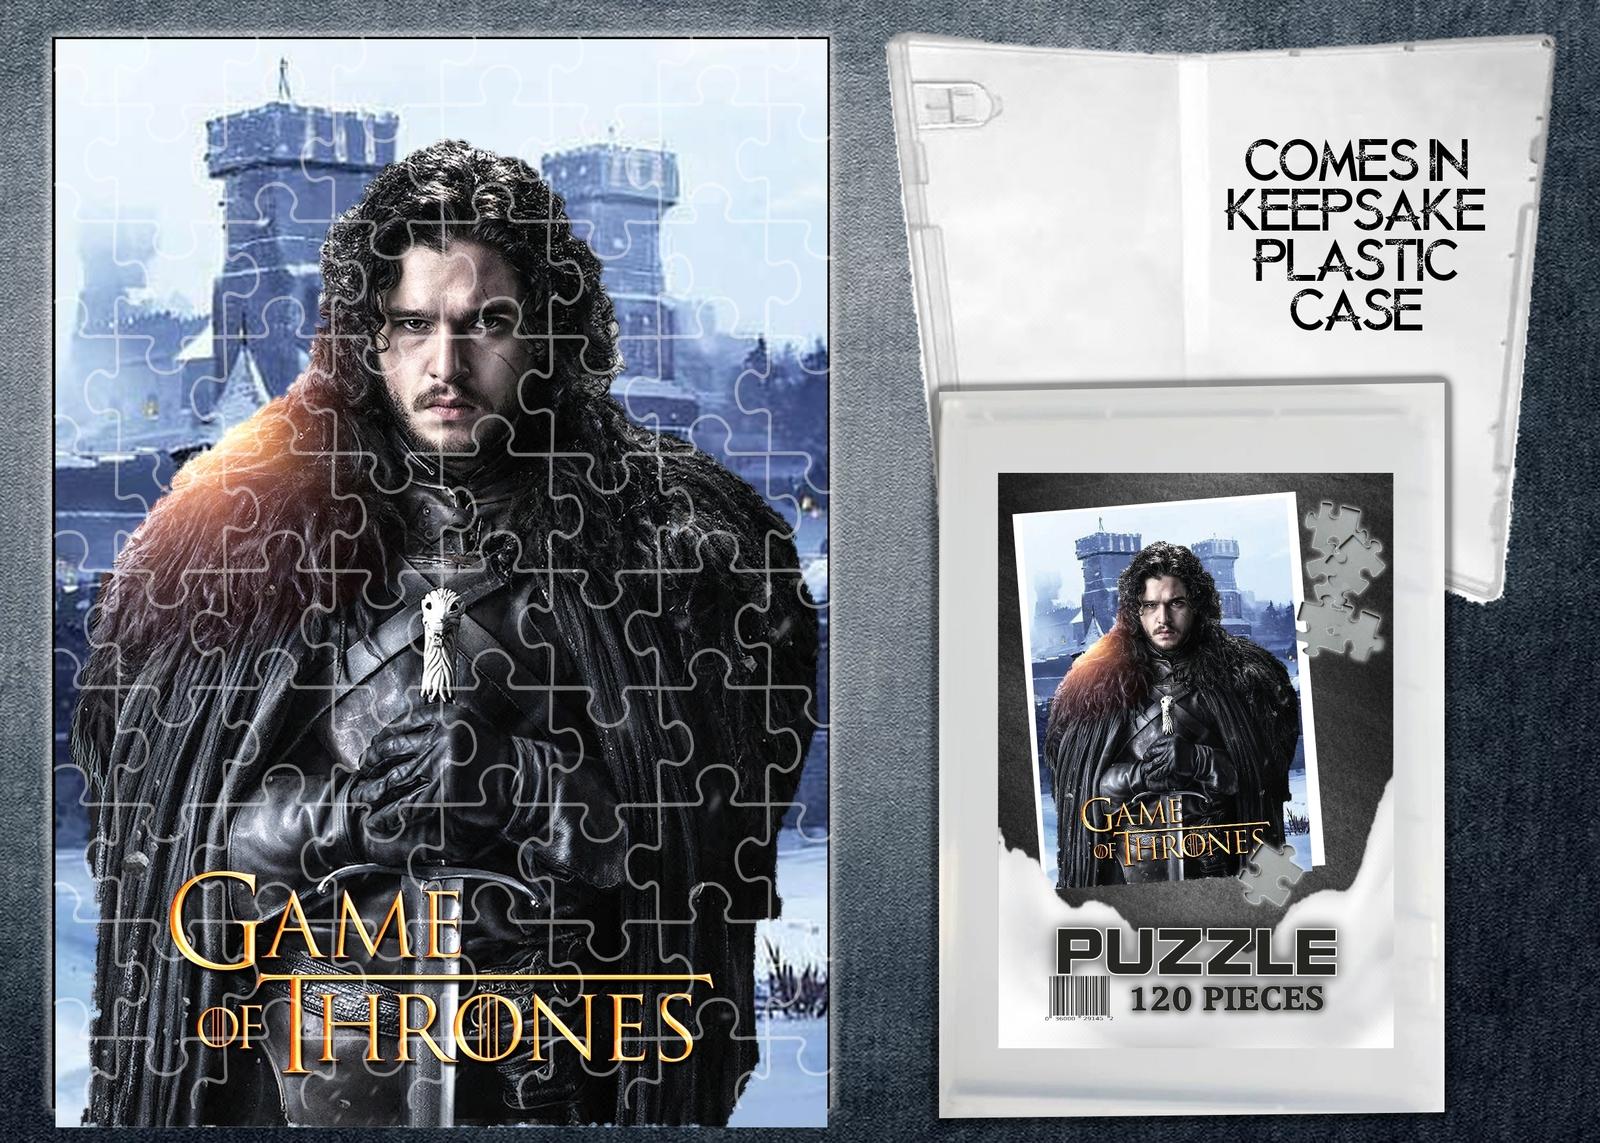 Game of Thrones Jon Snow TV Show 120 Piece Jigsaw Puzzle - $12.00